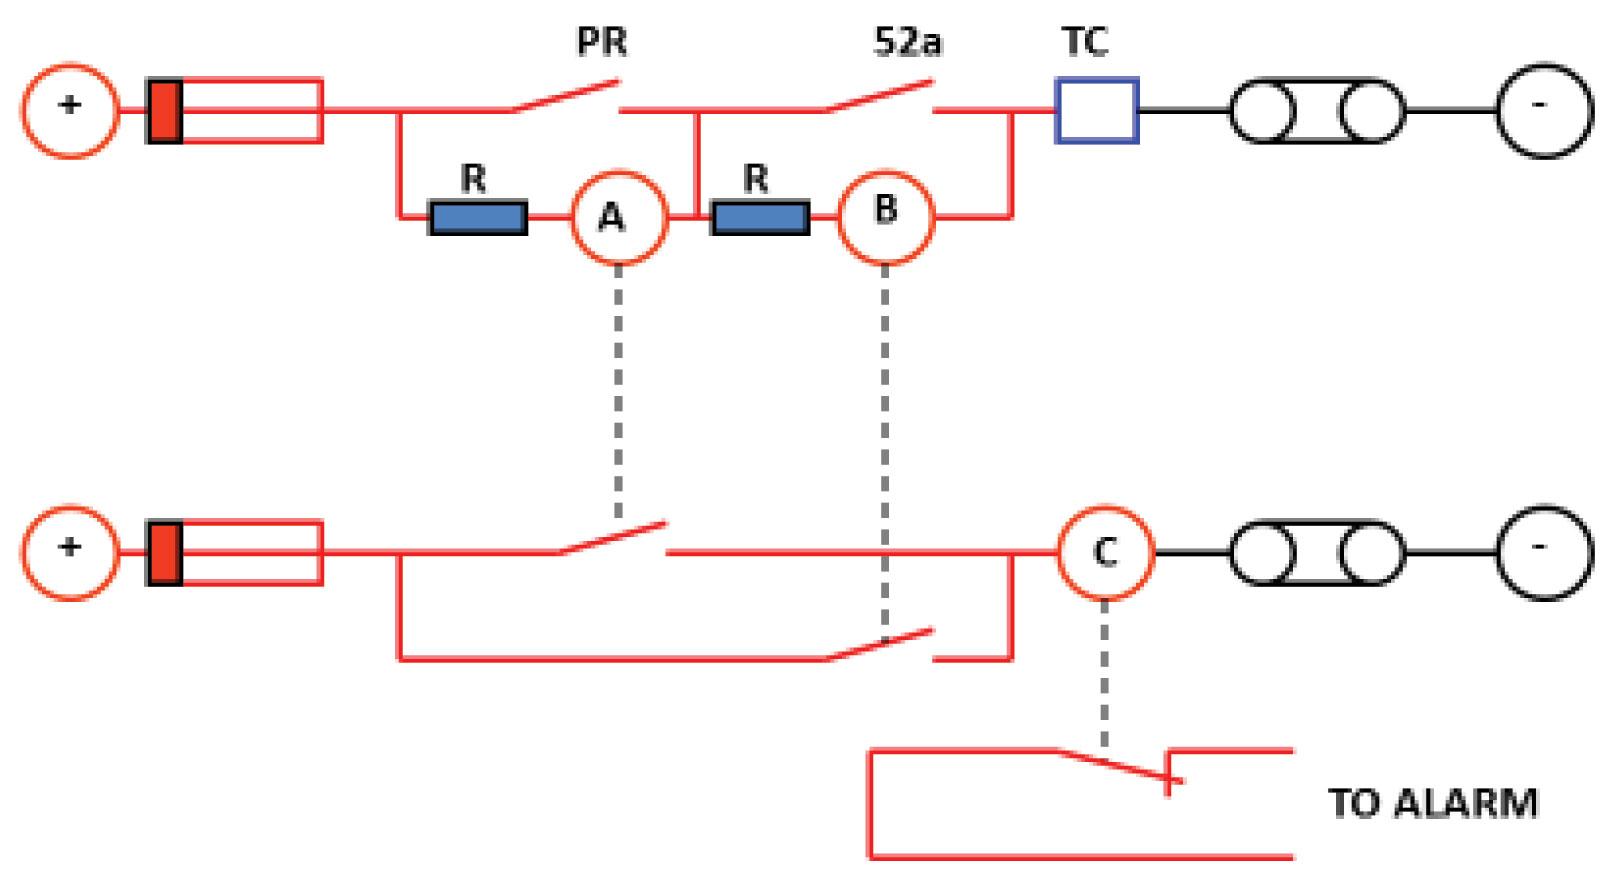 shunt trip coil diagram 1989 harley davidson softail wiring